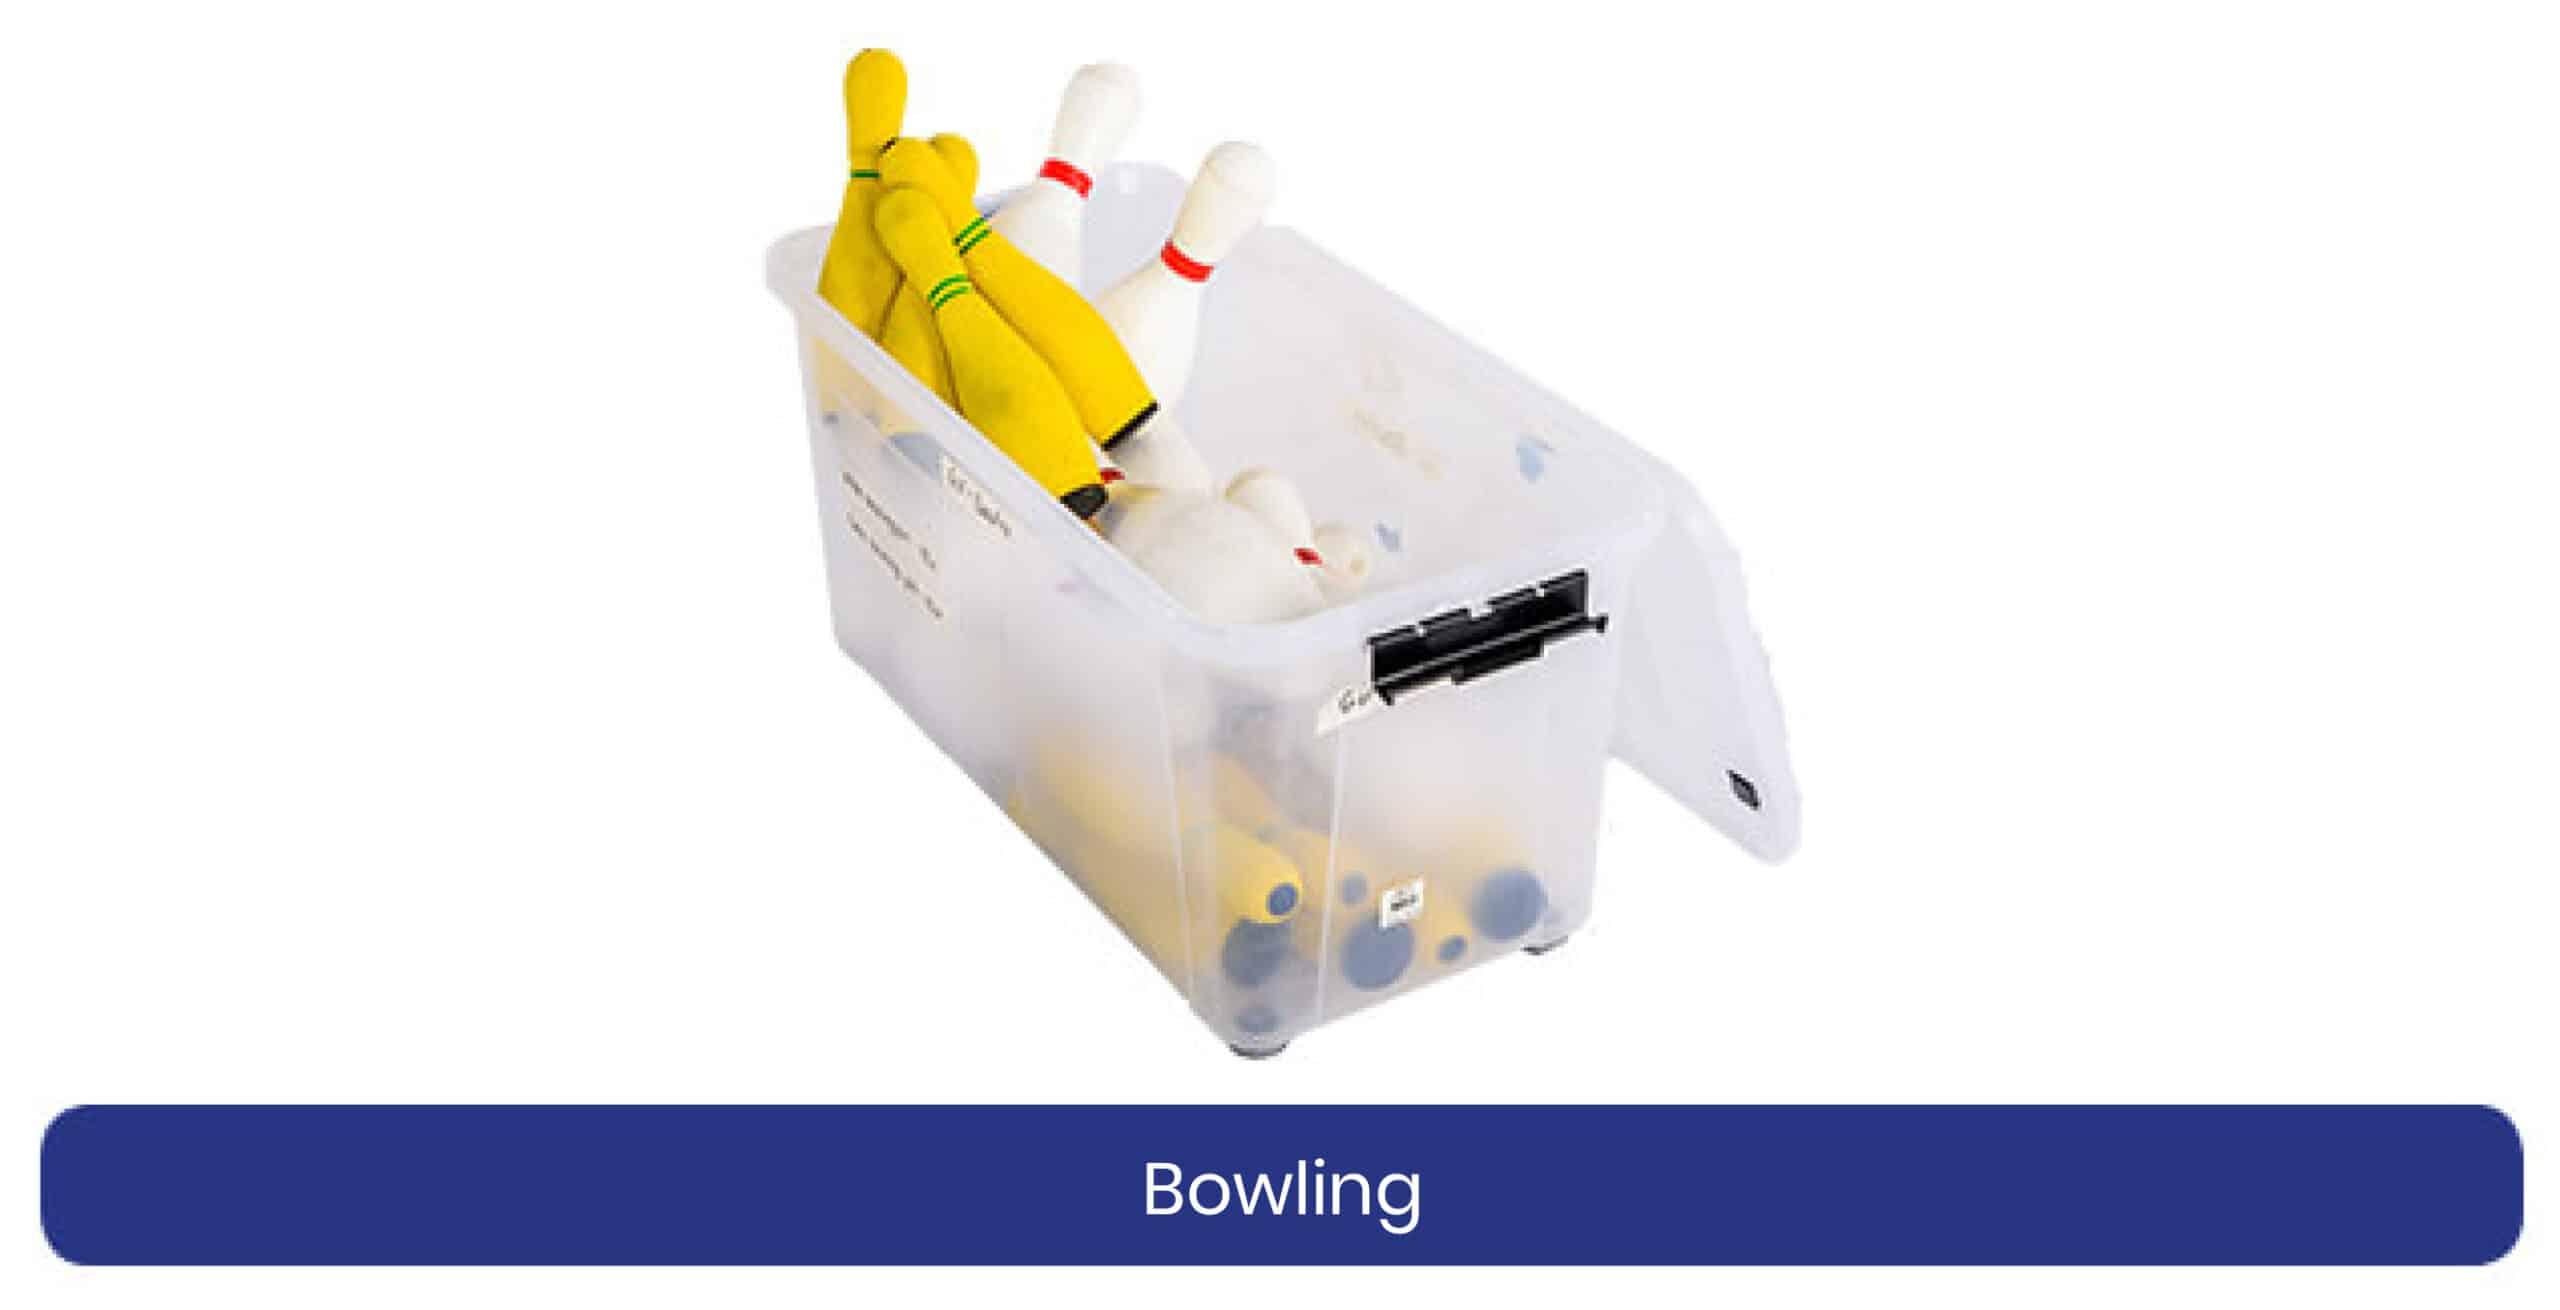 Bowling lenen product